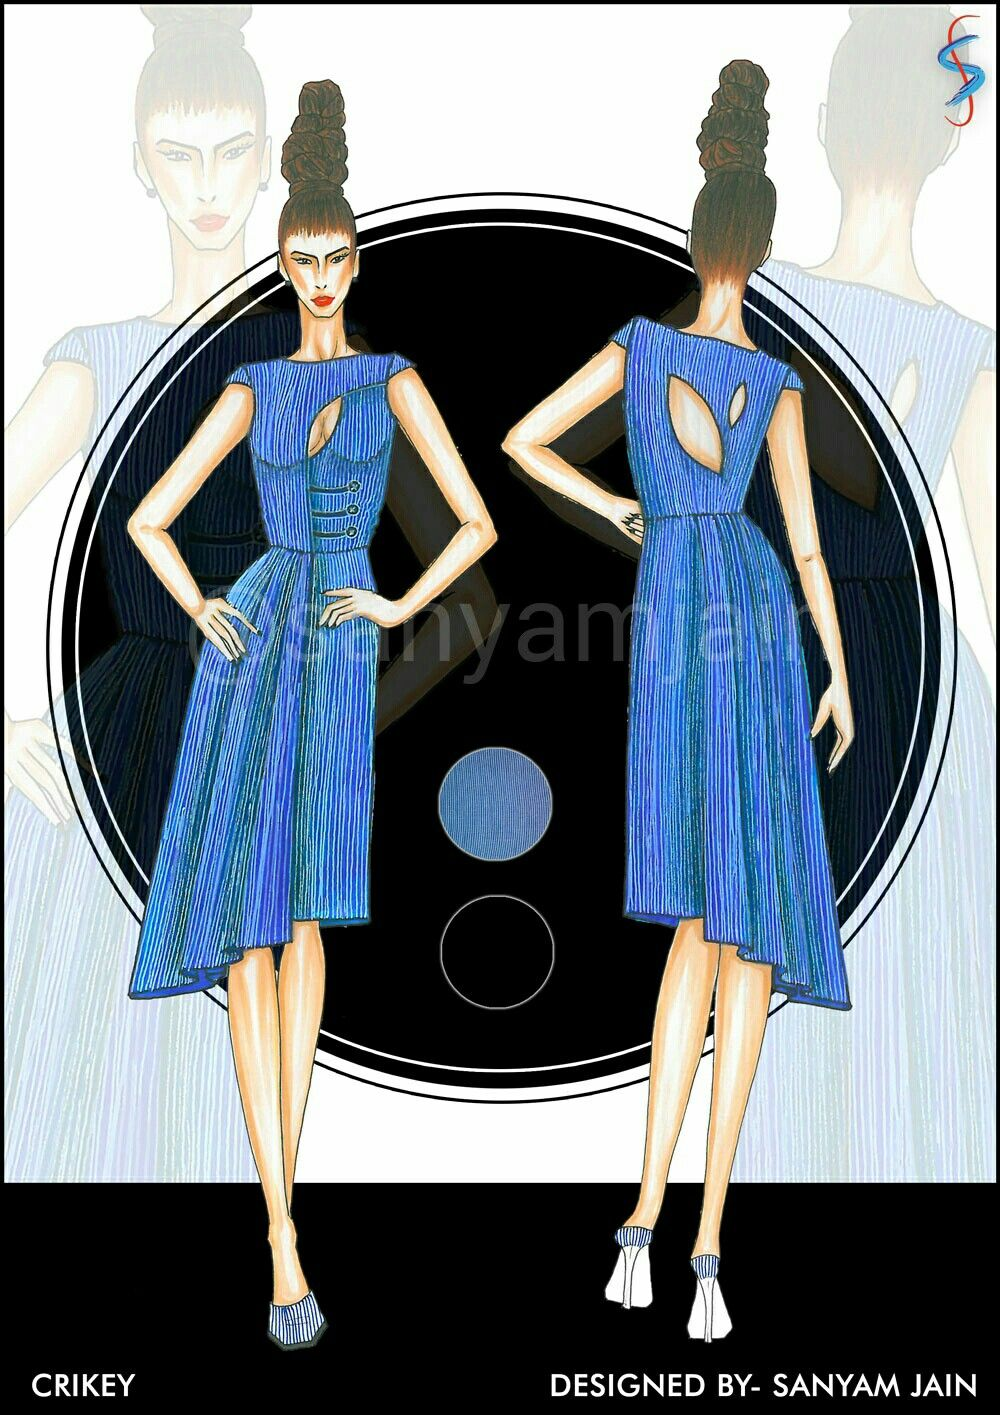 Crikey Hashboosh Voonik Competition Beautiful Indian Kurtis Tunics And Dresses Designed By Sanyam Jai Fashion Illustration Fashion Design Fashion Illustrator